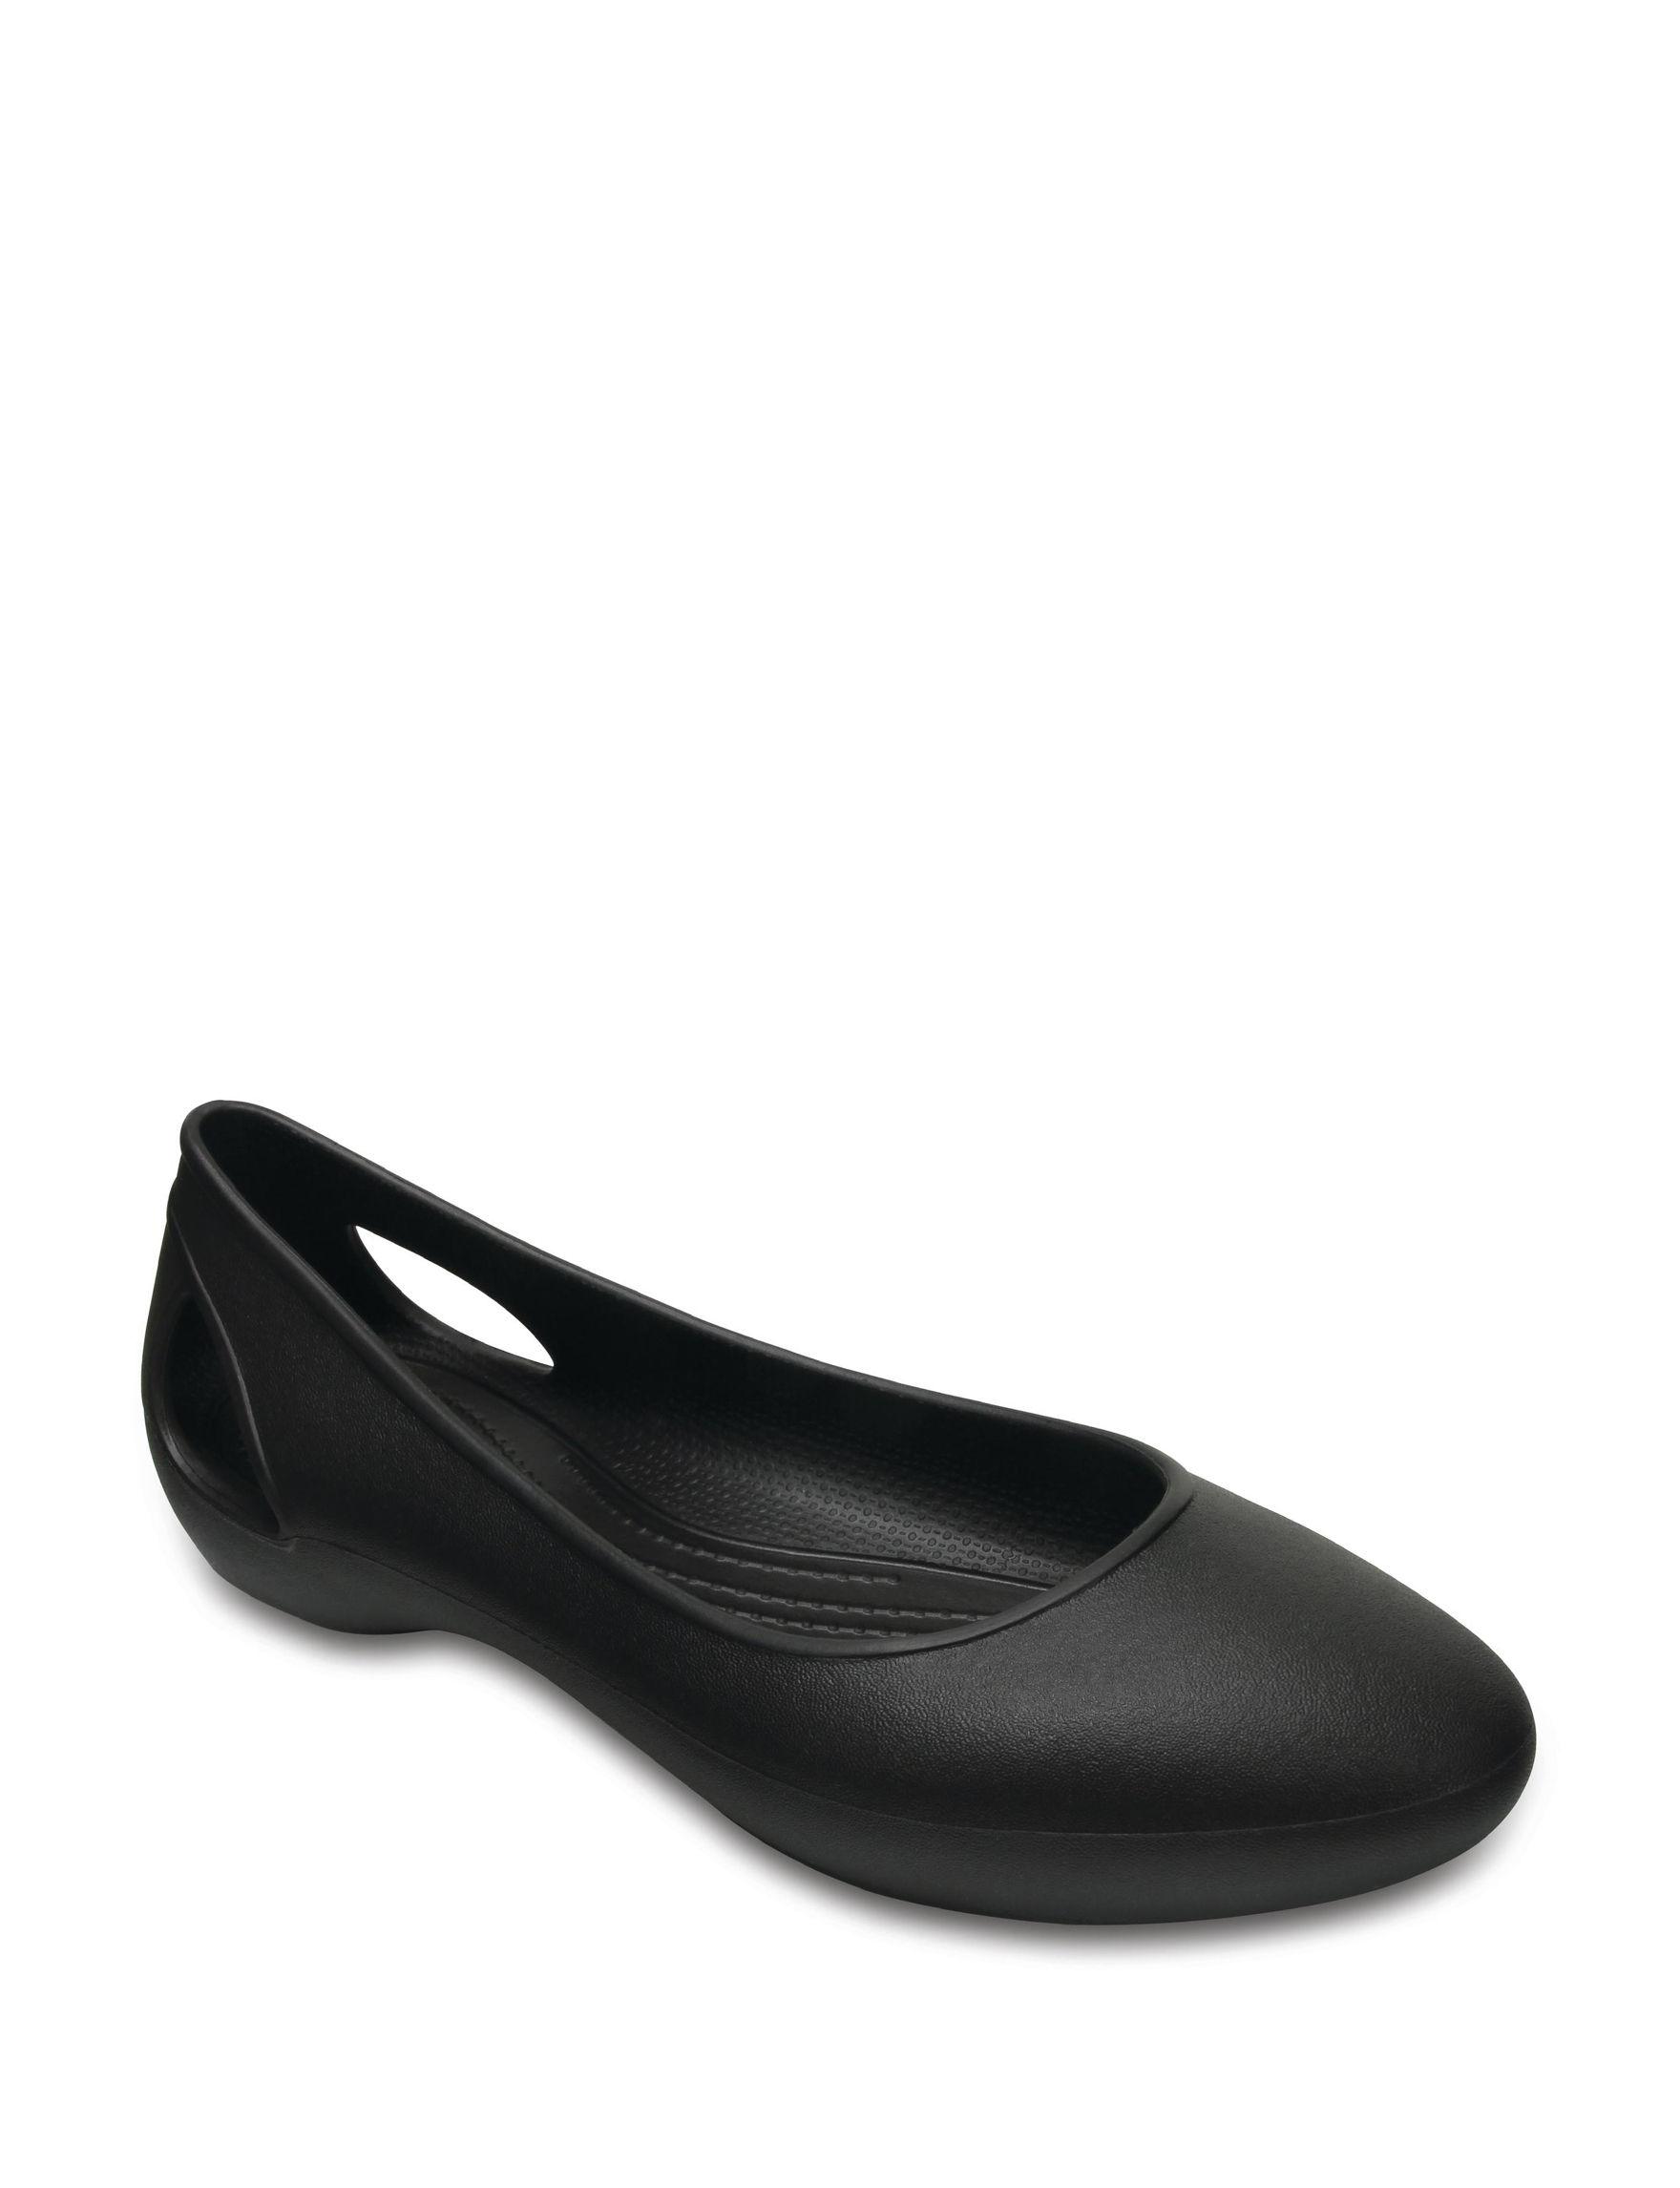 Crocs Black Comfort